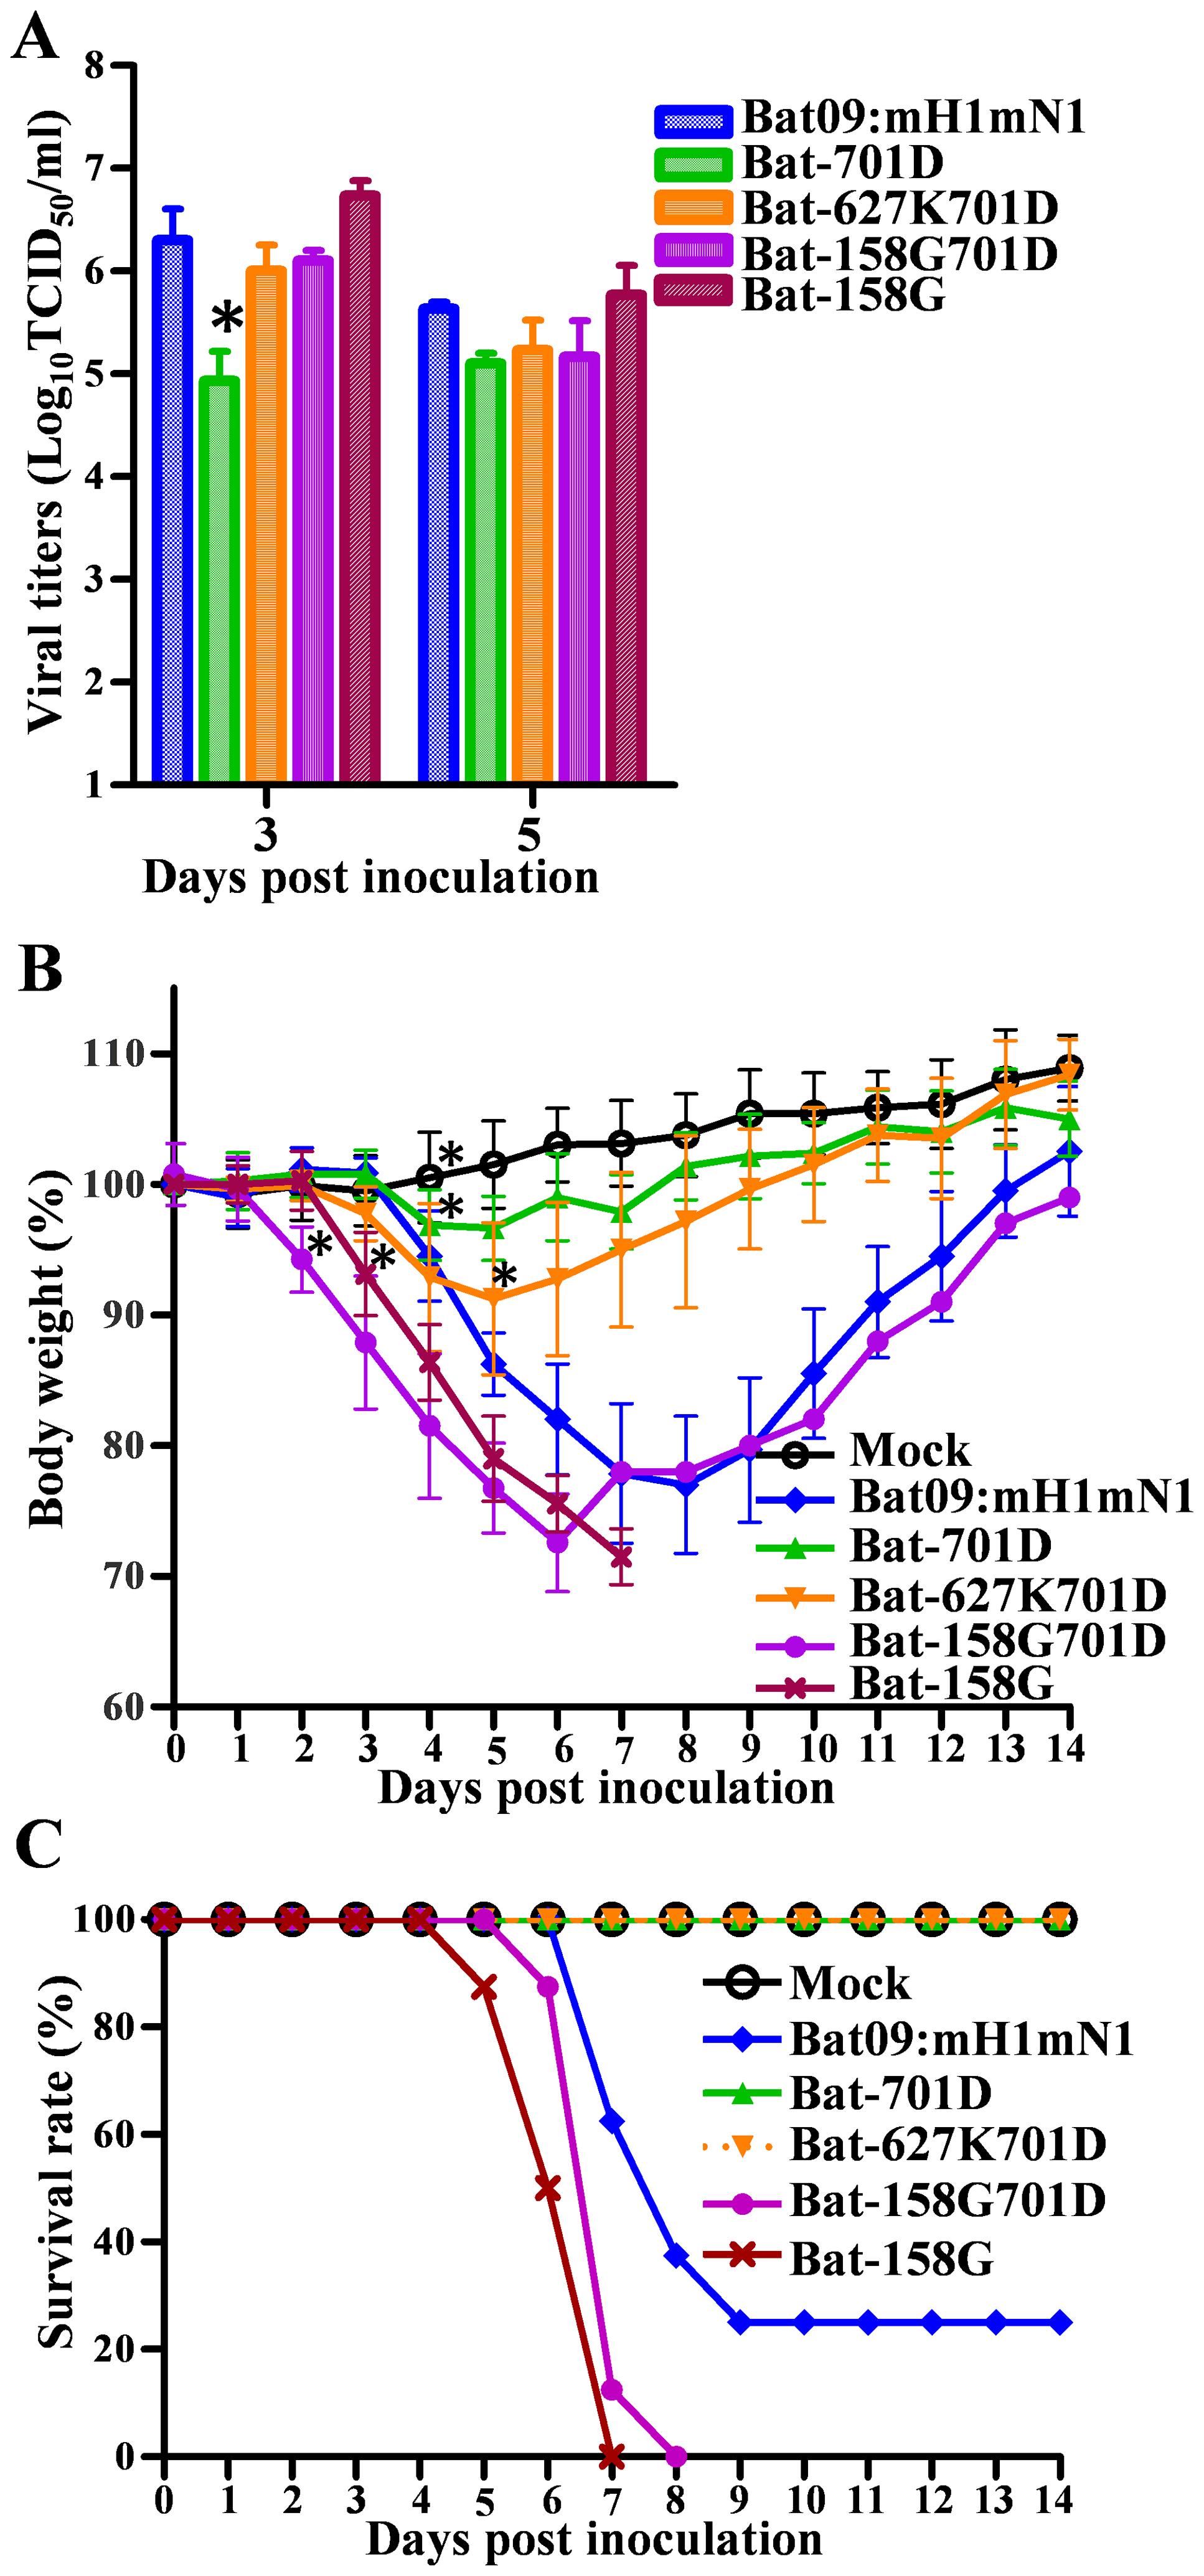 Pathogenicity of Bat-PB2 mutants in mice.